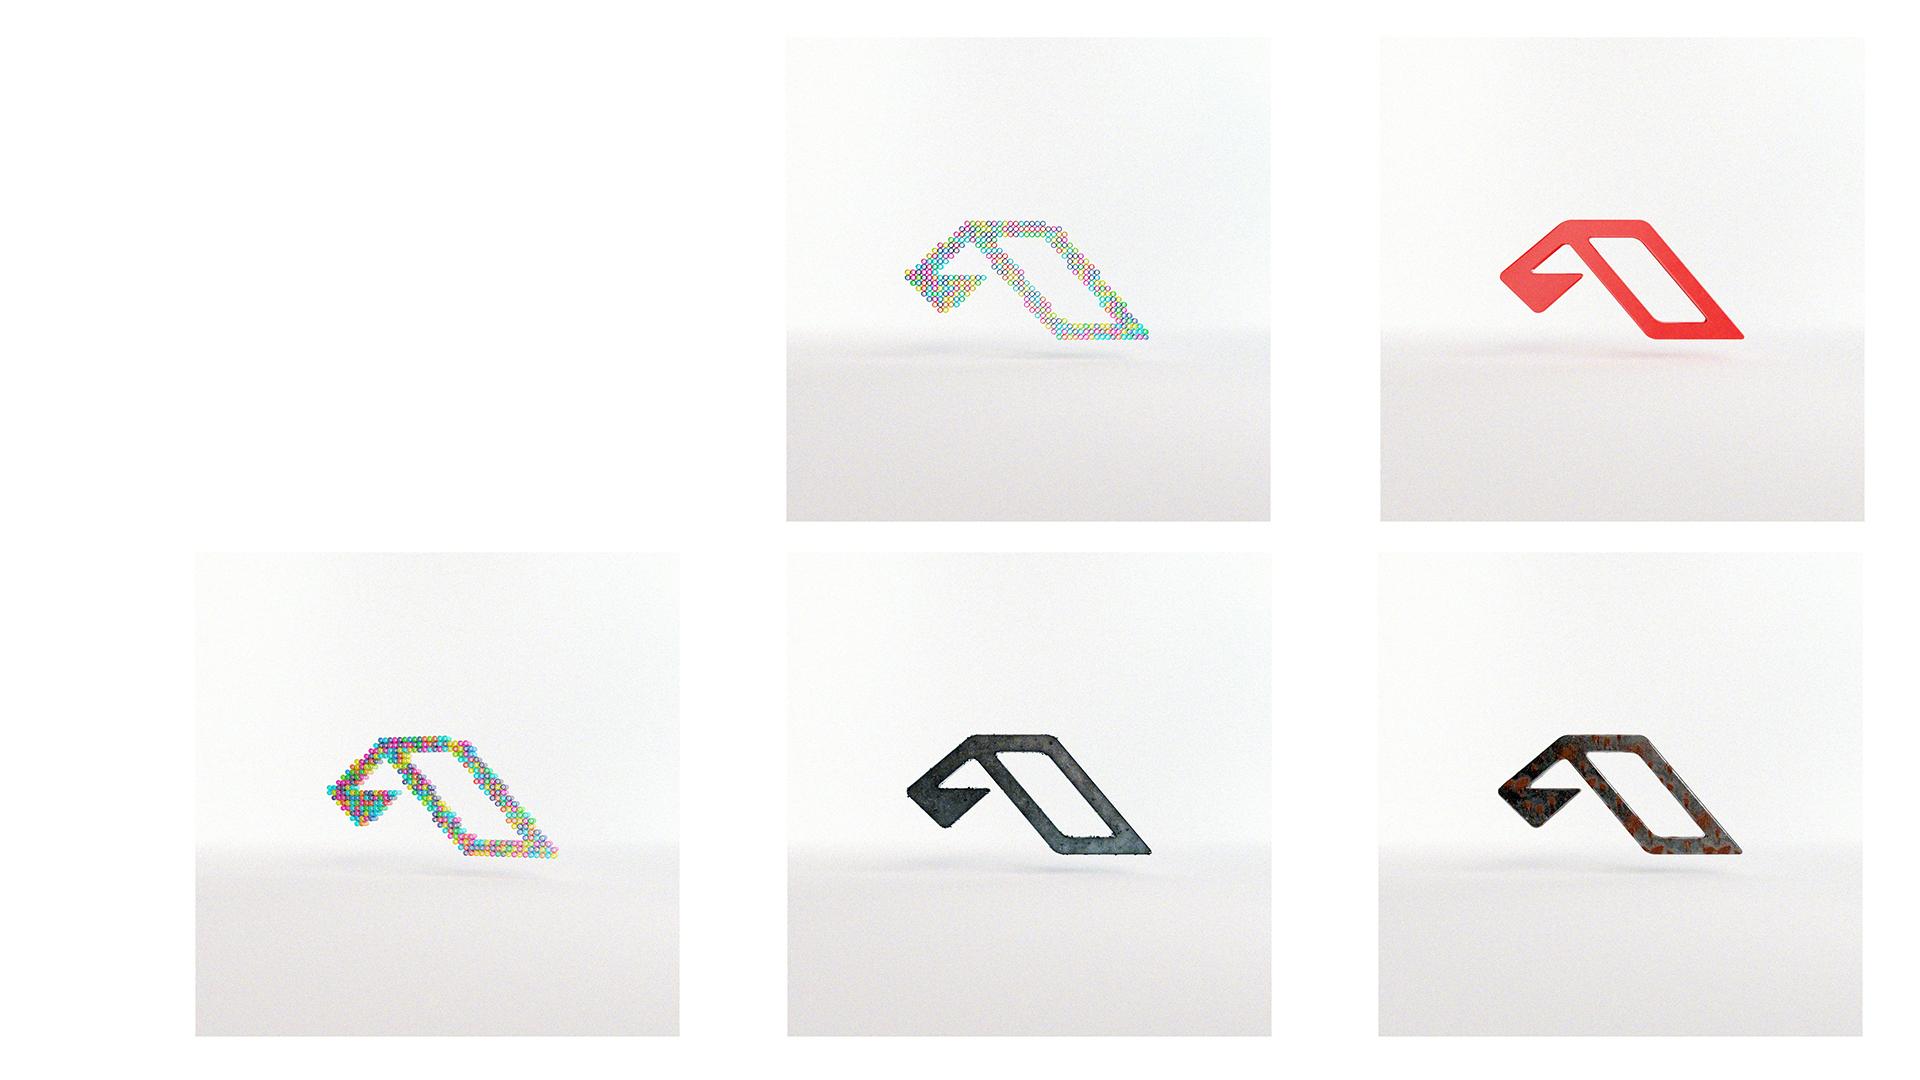 Anjunabeats-20-Years-Artworking-V2